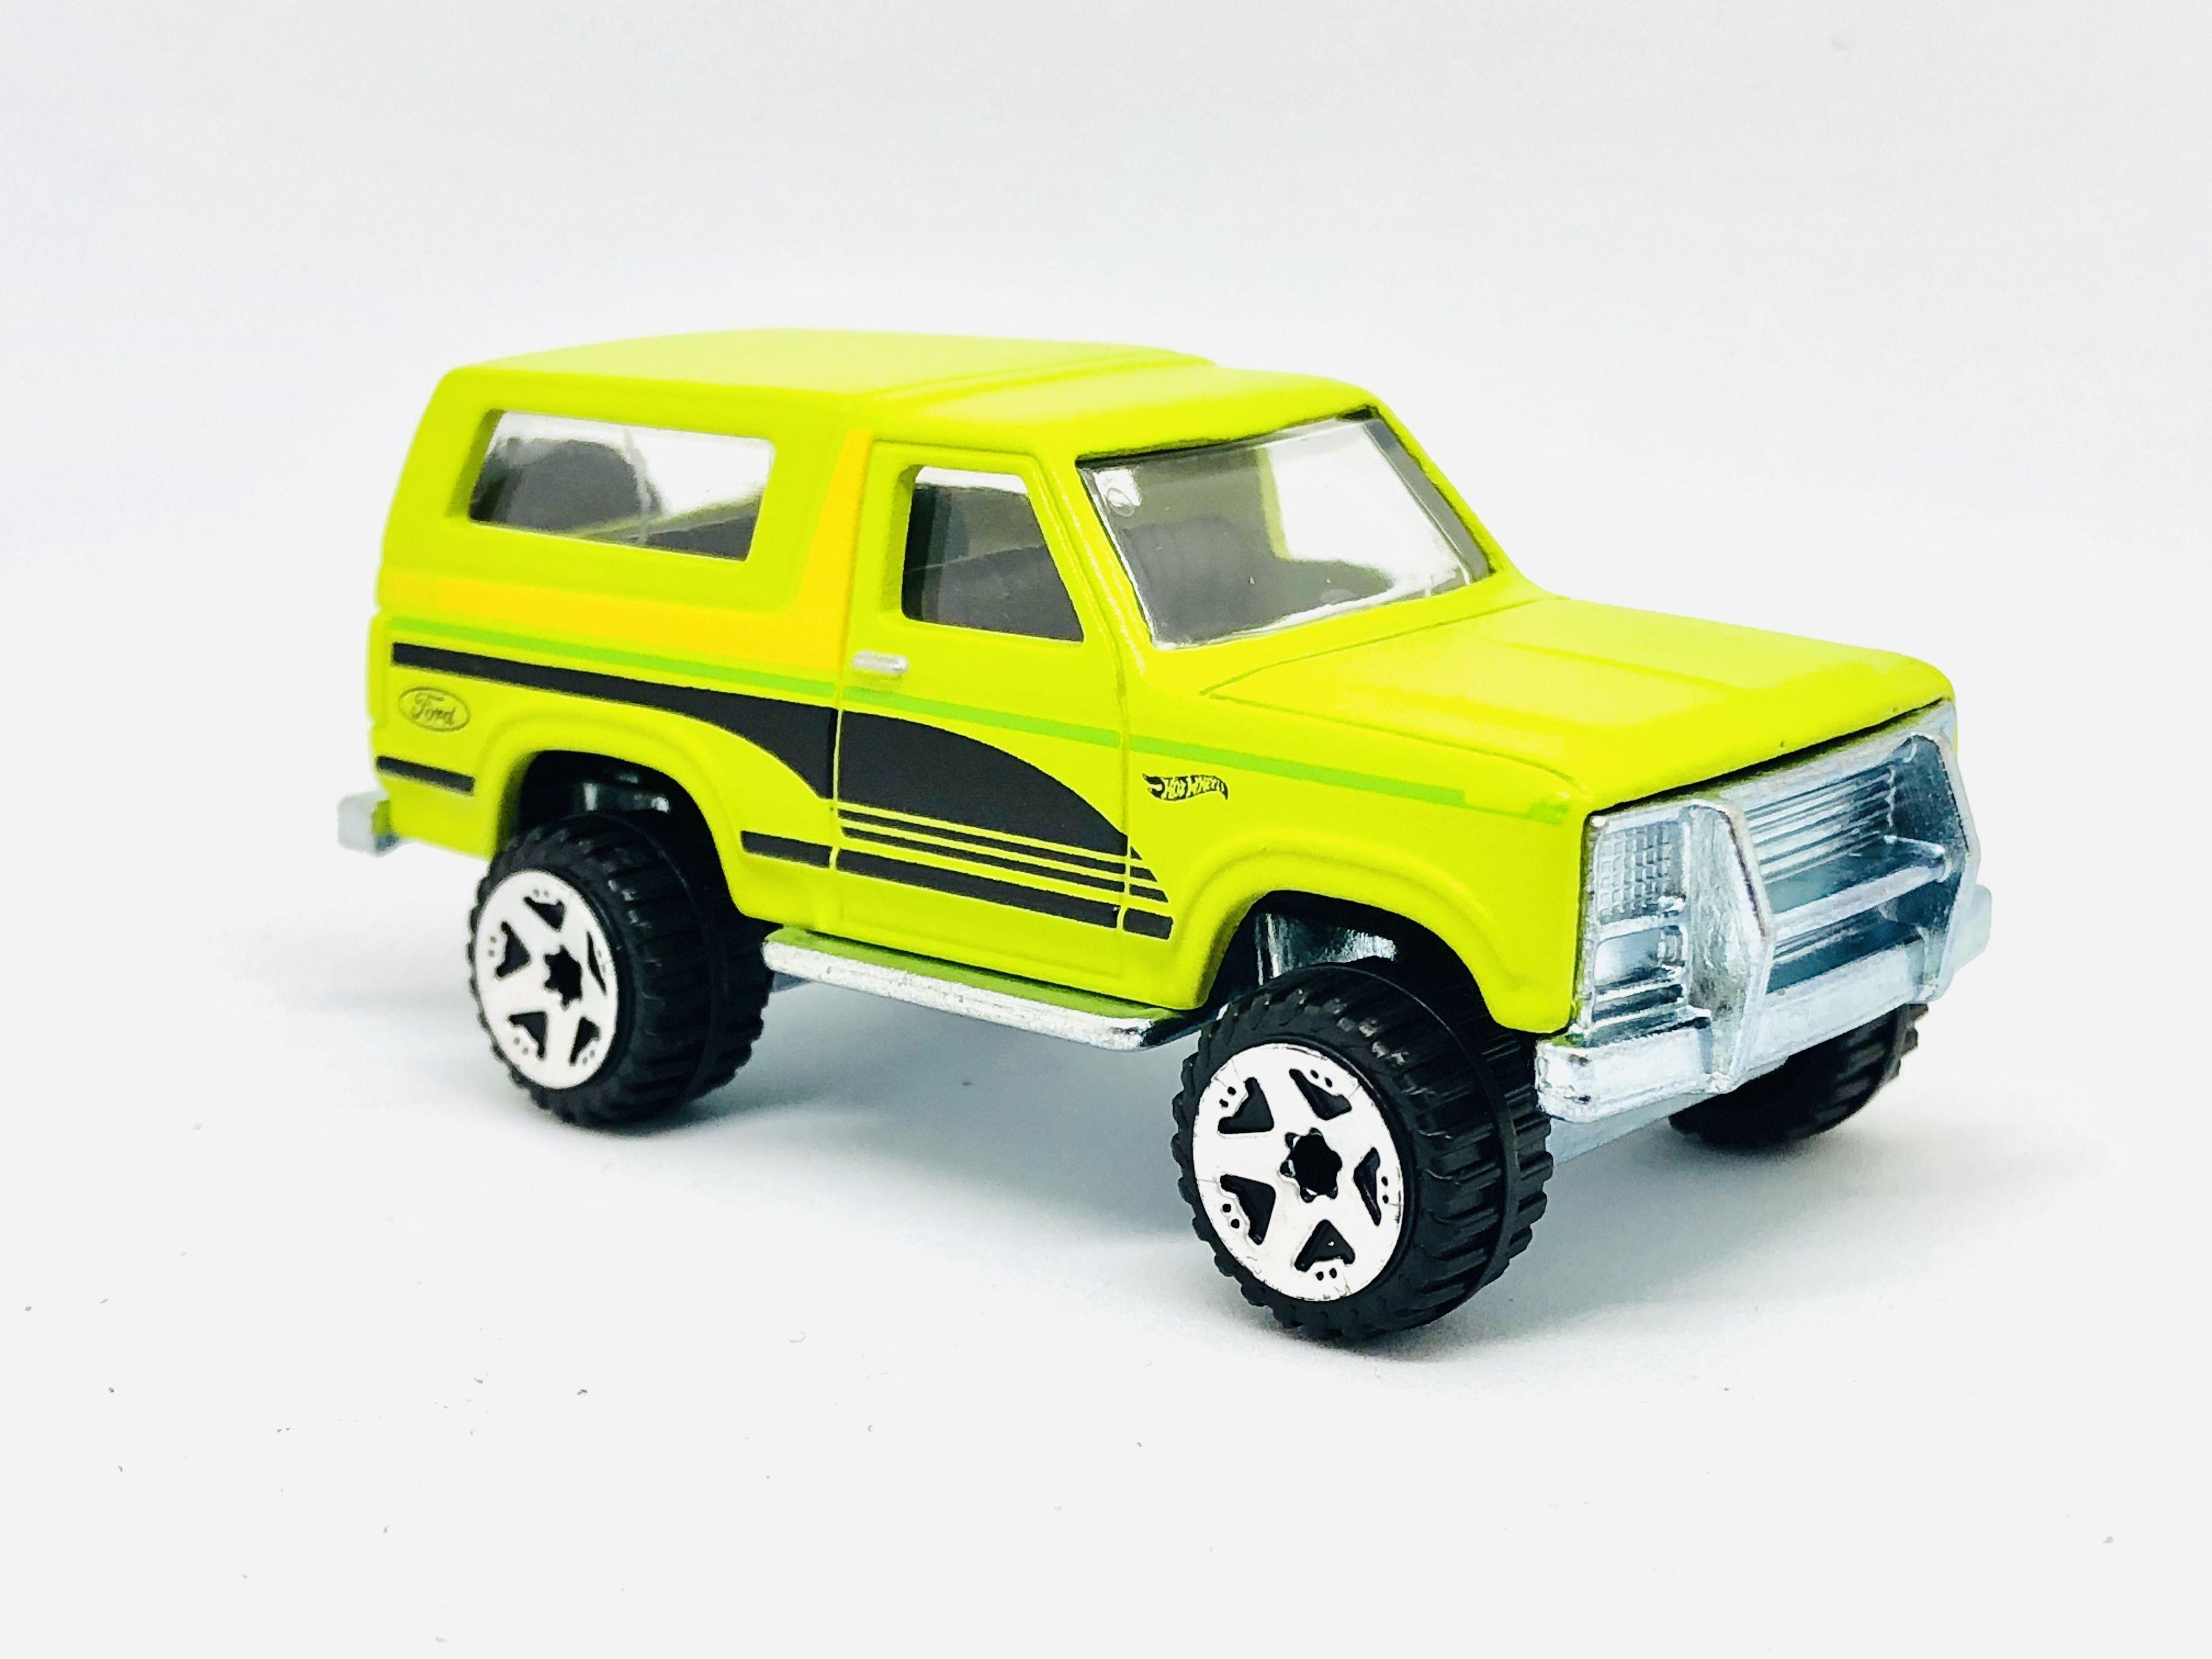 Hw Ford Broncos In Neon Doft Green Hot Wheels Ford Bronco Toy Car